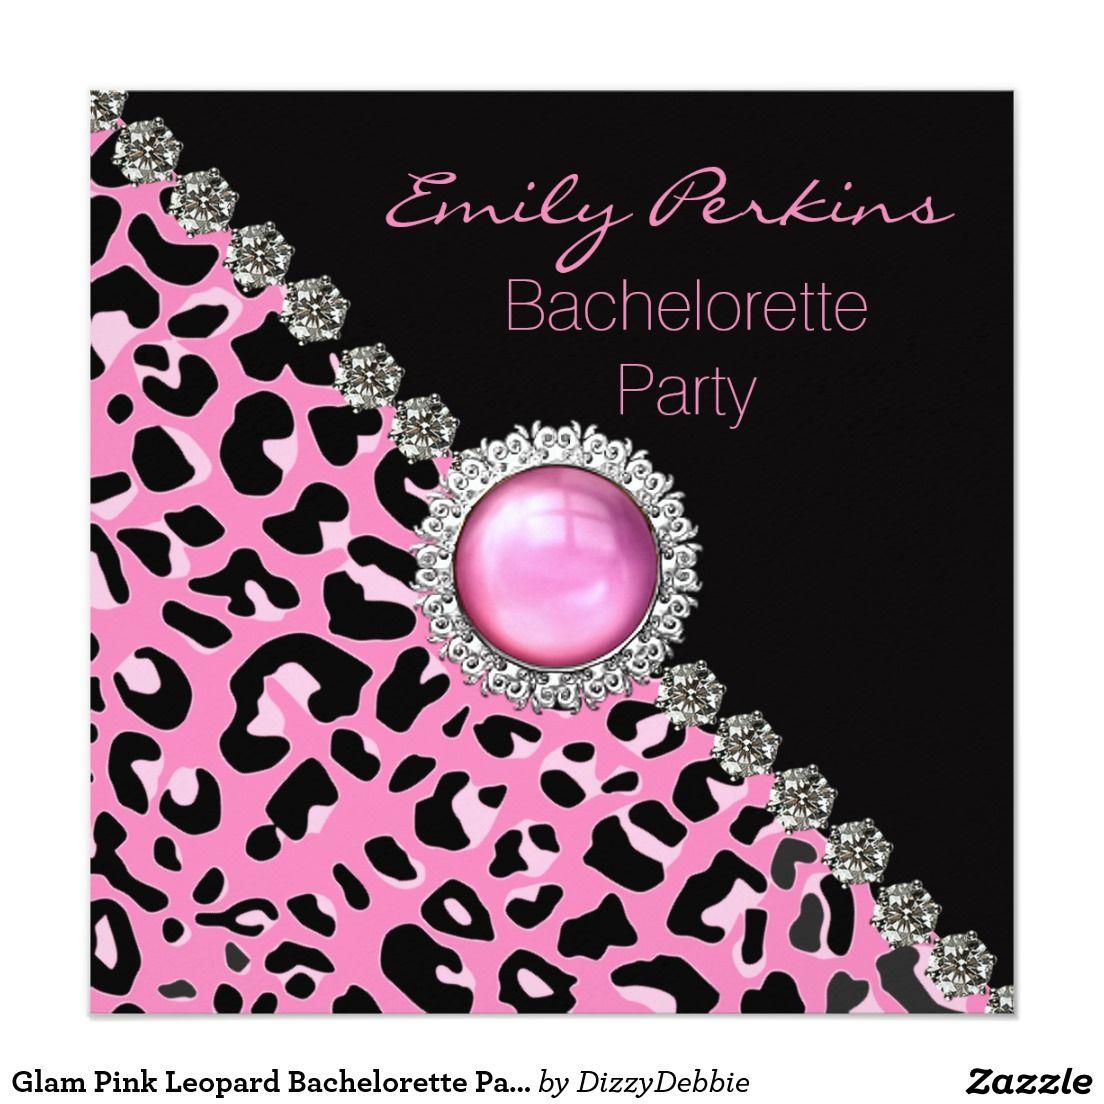 Glam Pink Leopard Bachelorette Party Invitation